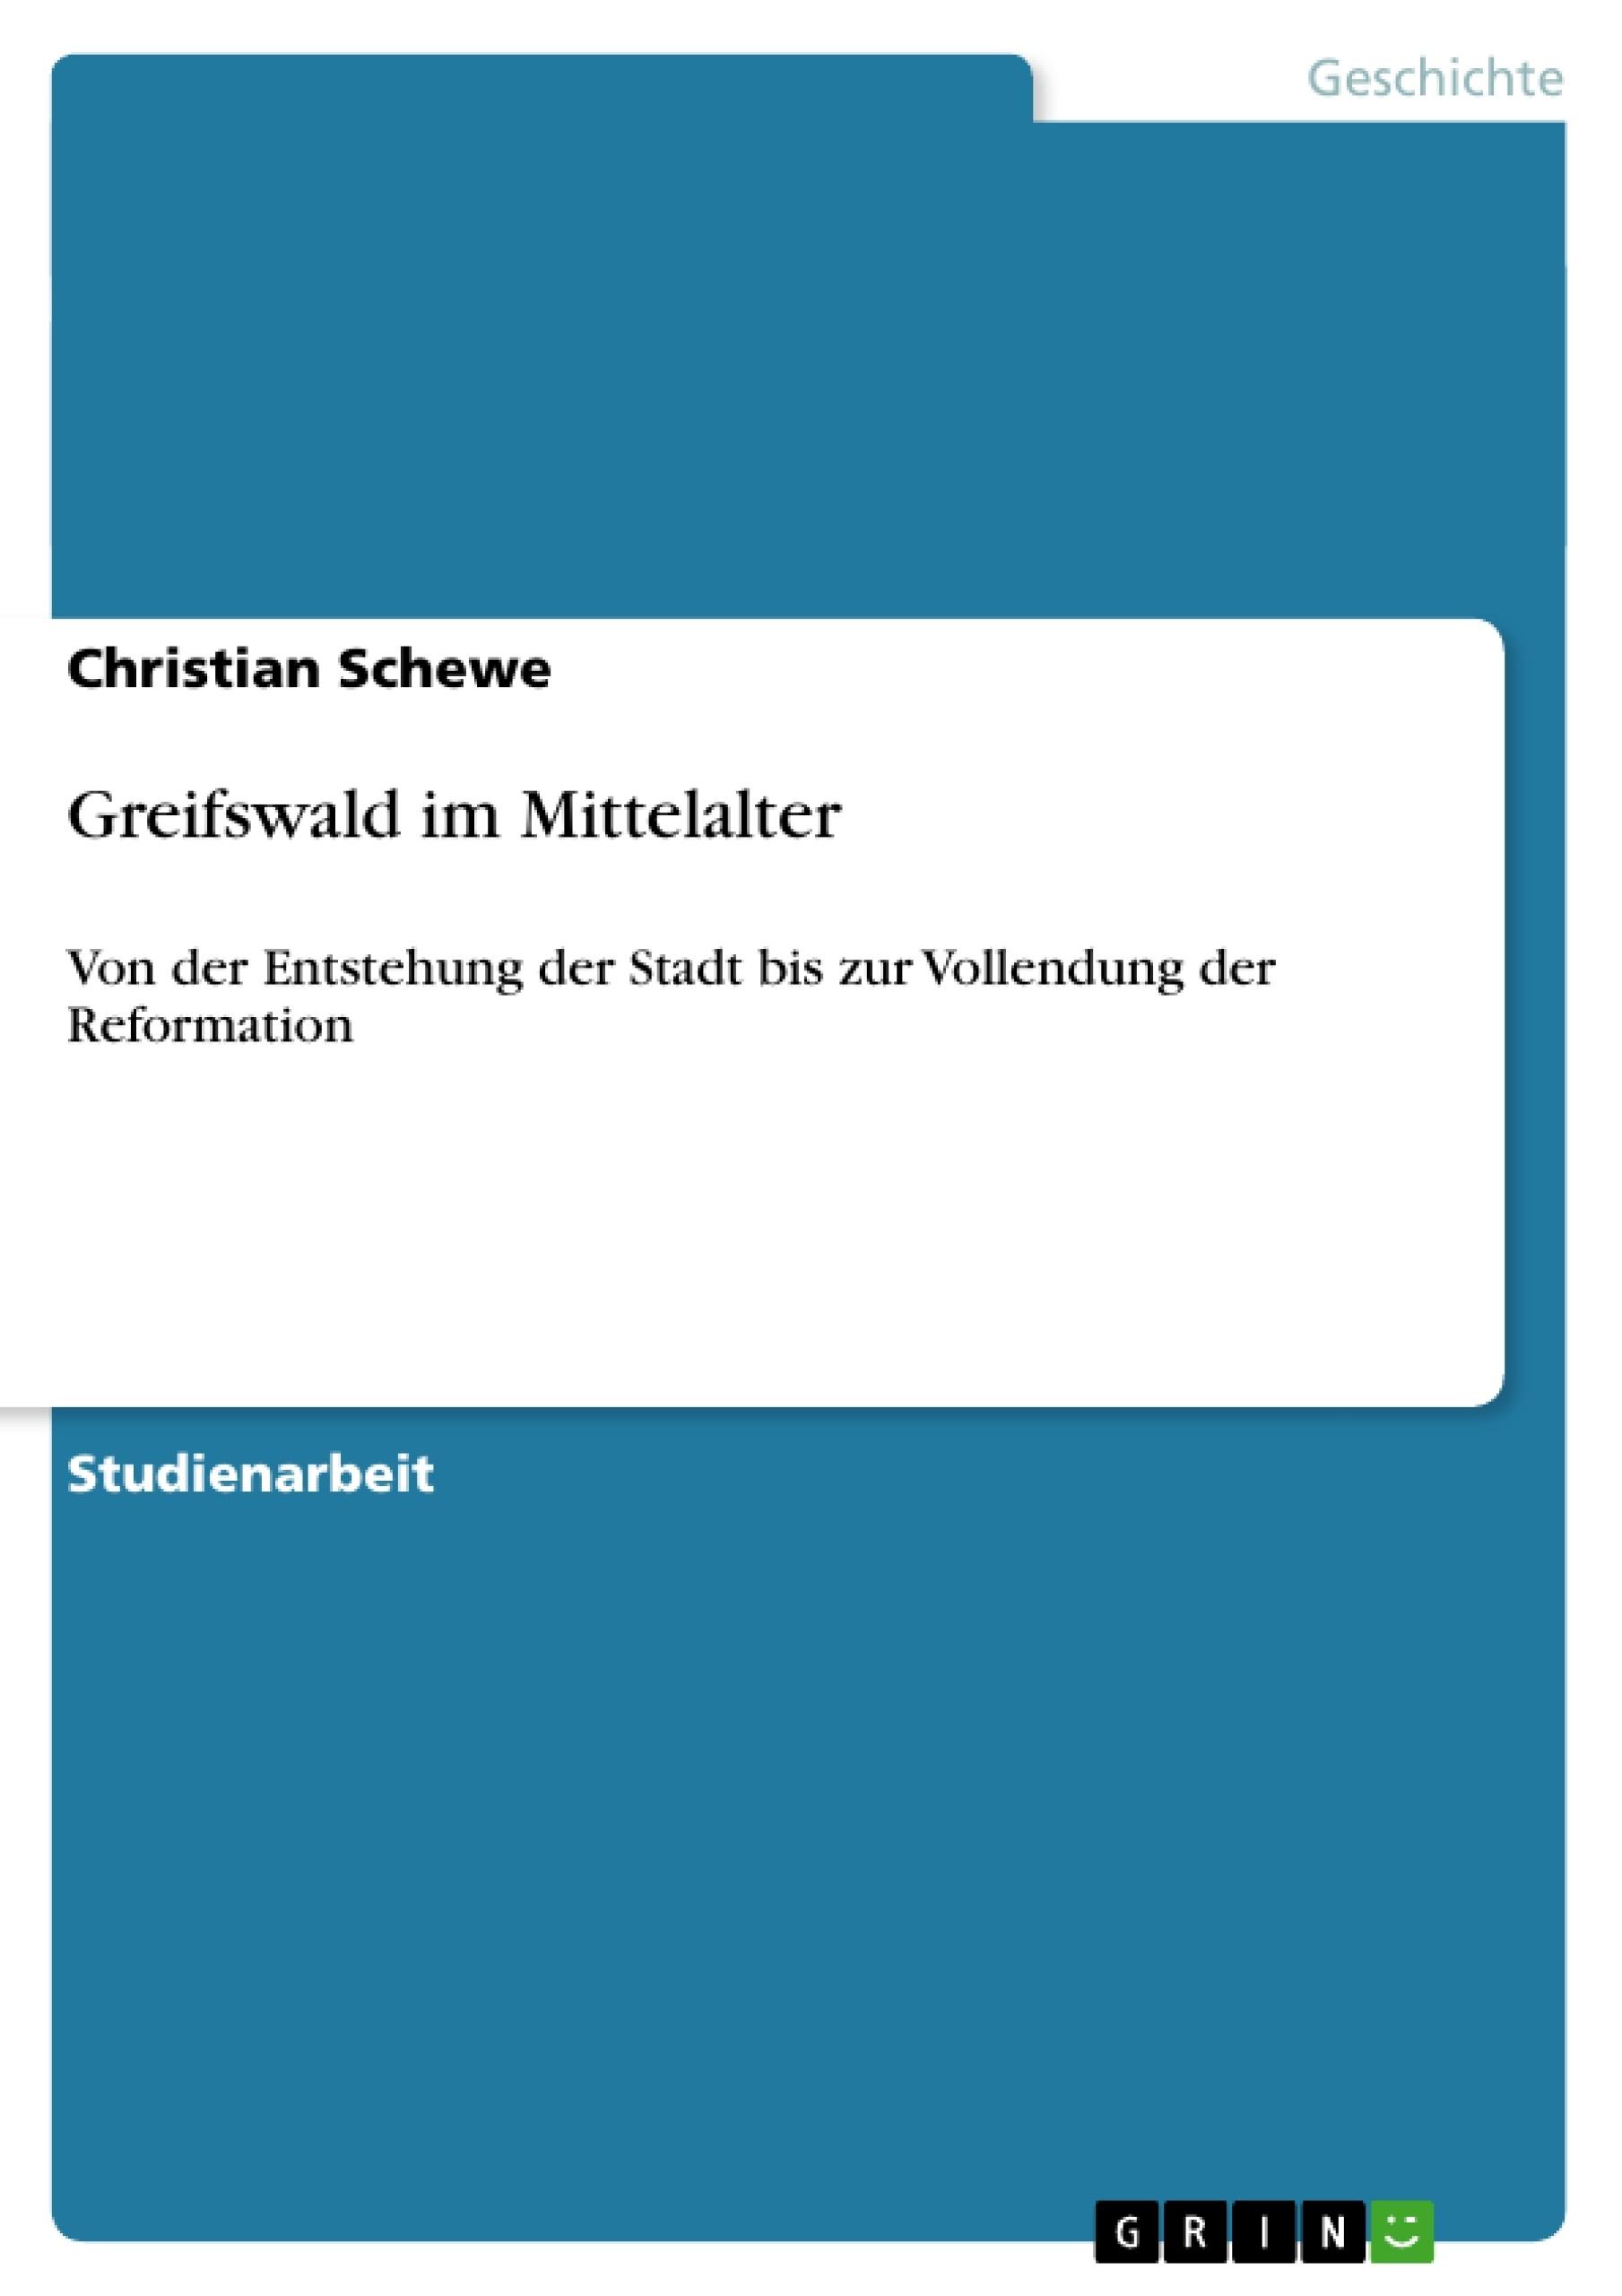 Titel: Greifswald im Mittelalter